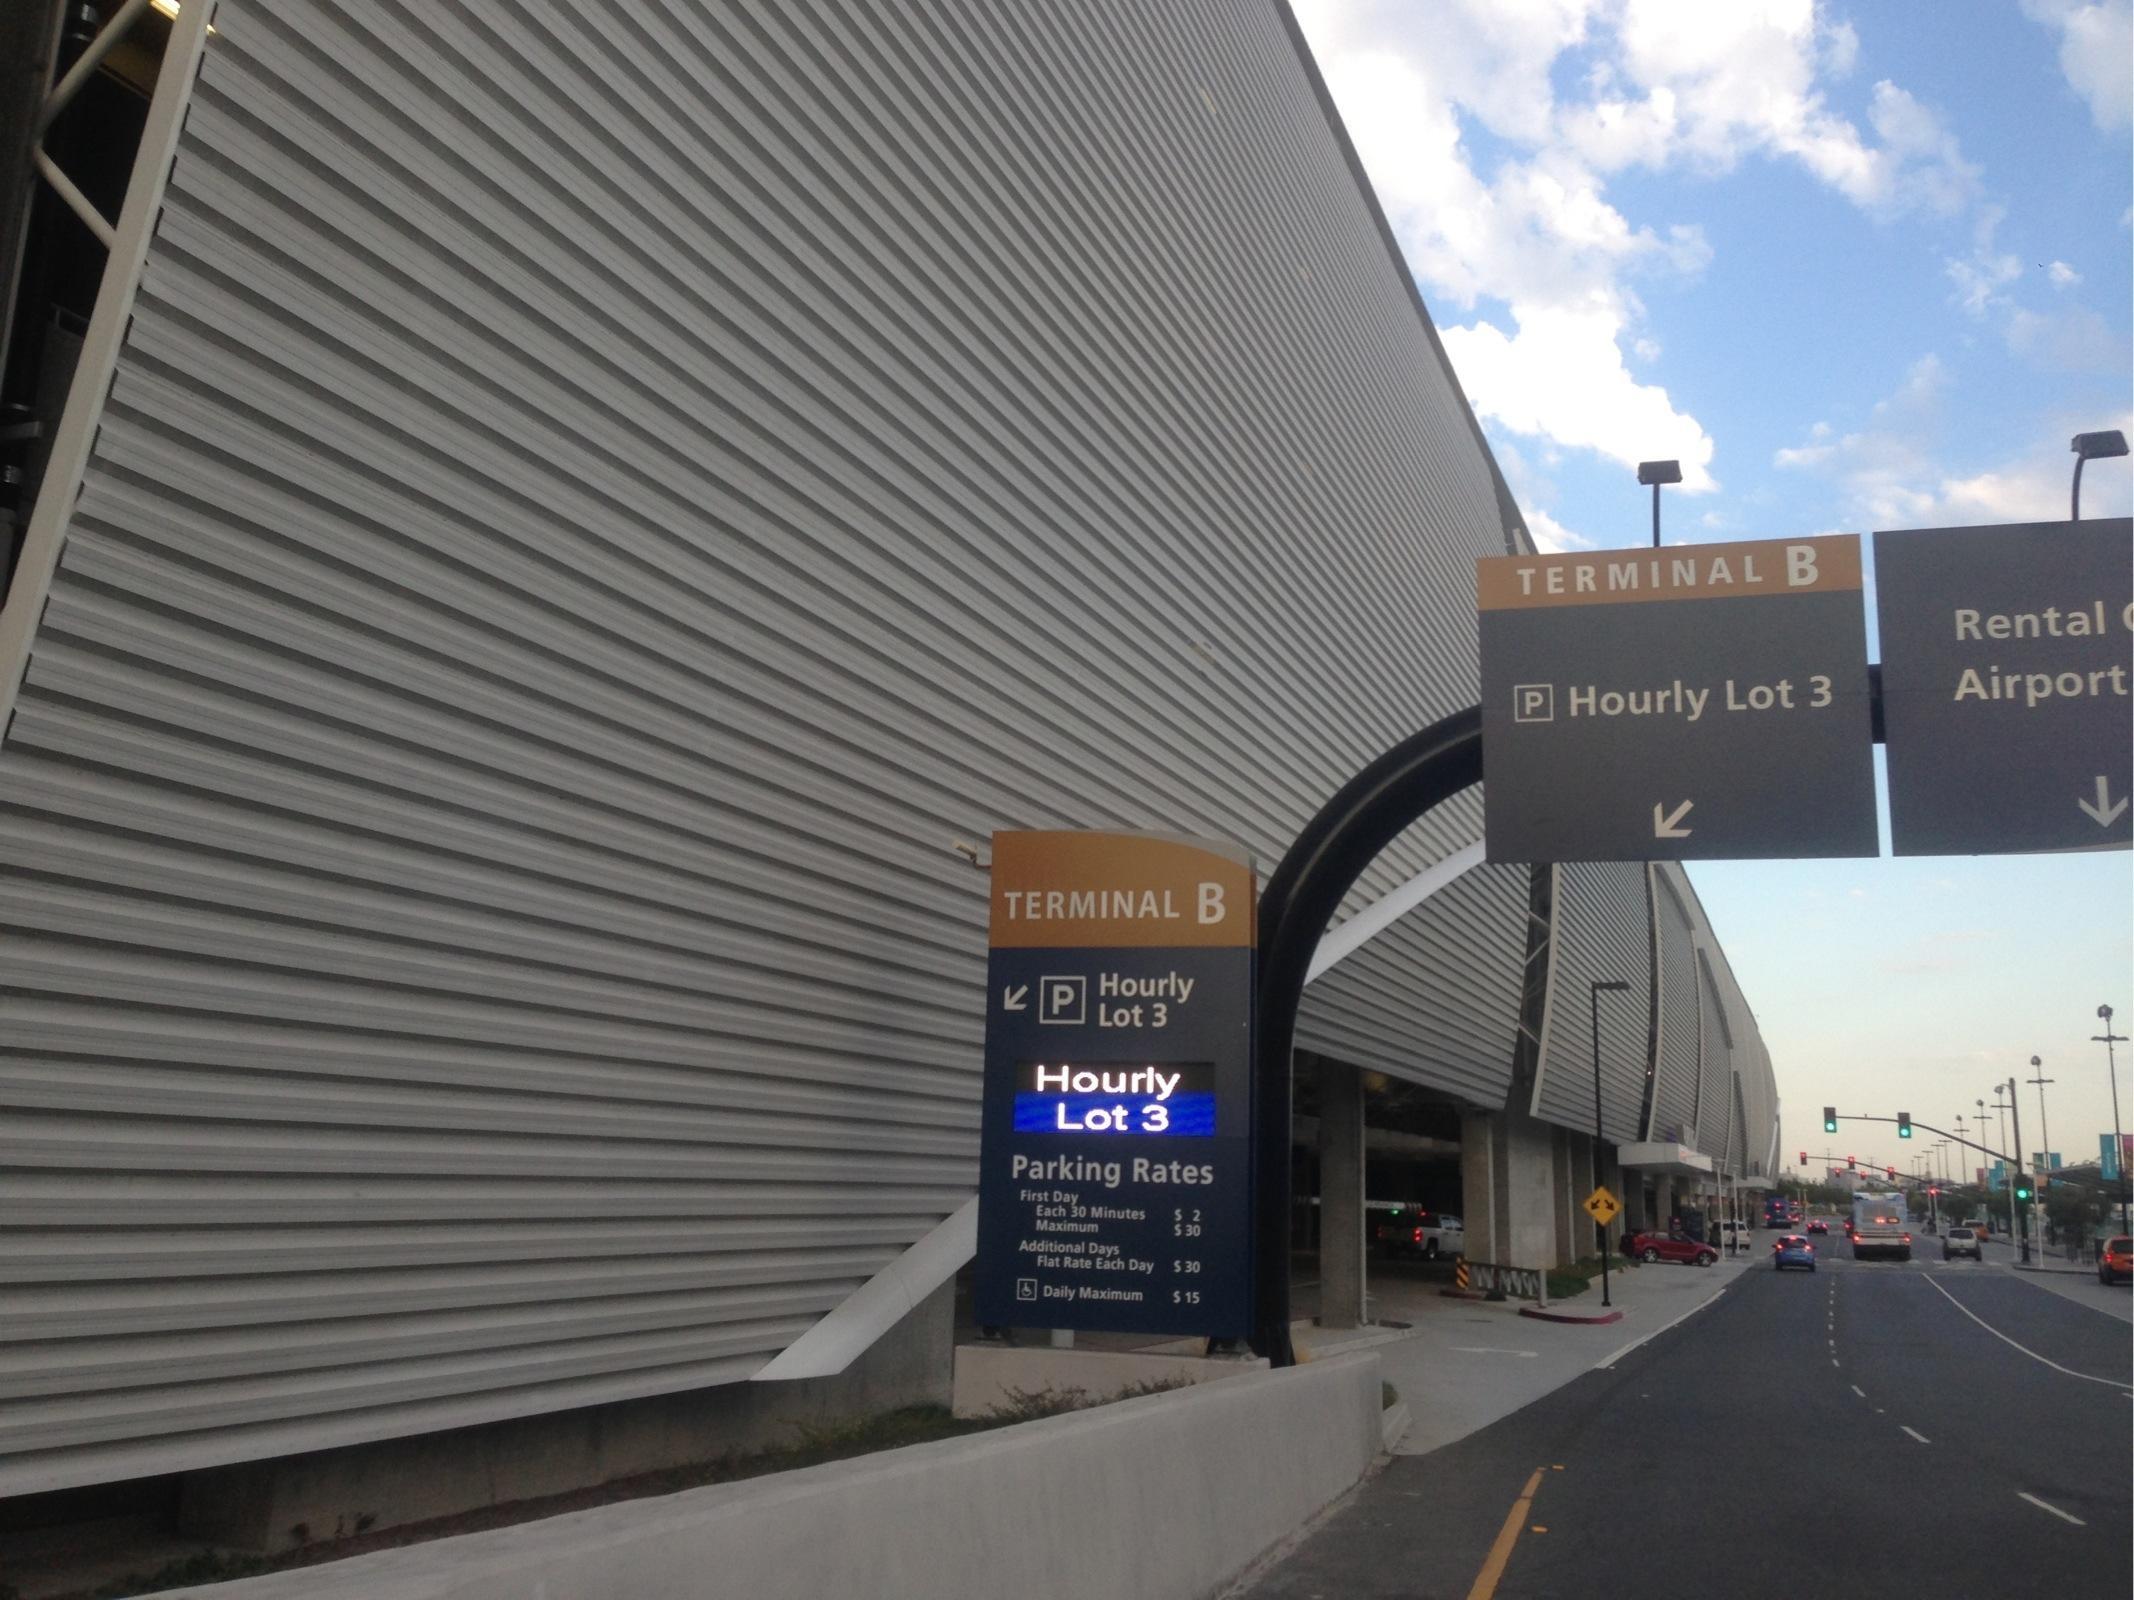 SJC Terminal B Hourly Lot 3 Parking in San Jose ParkMe